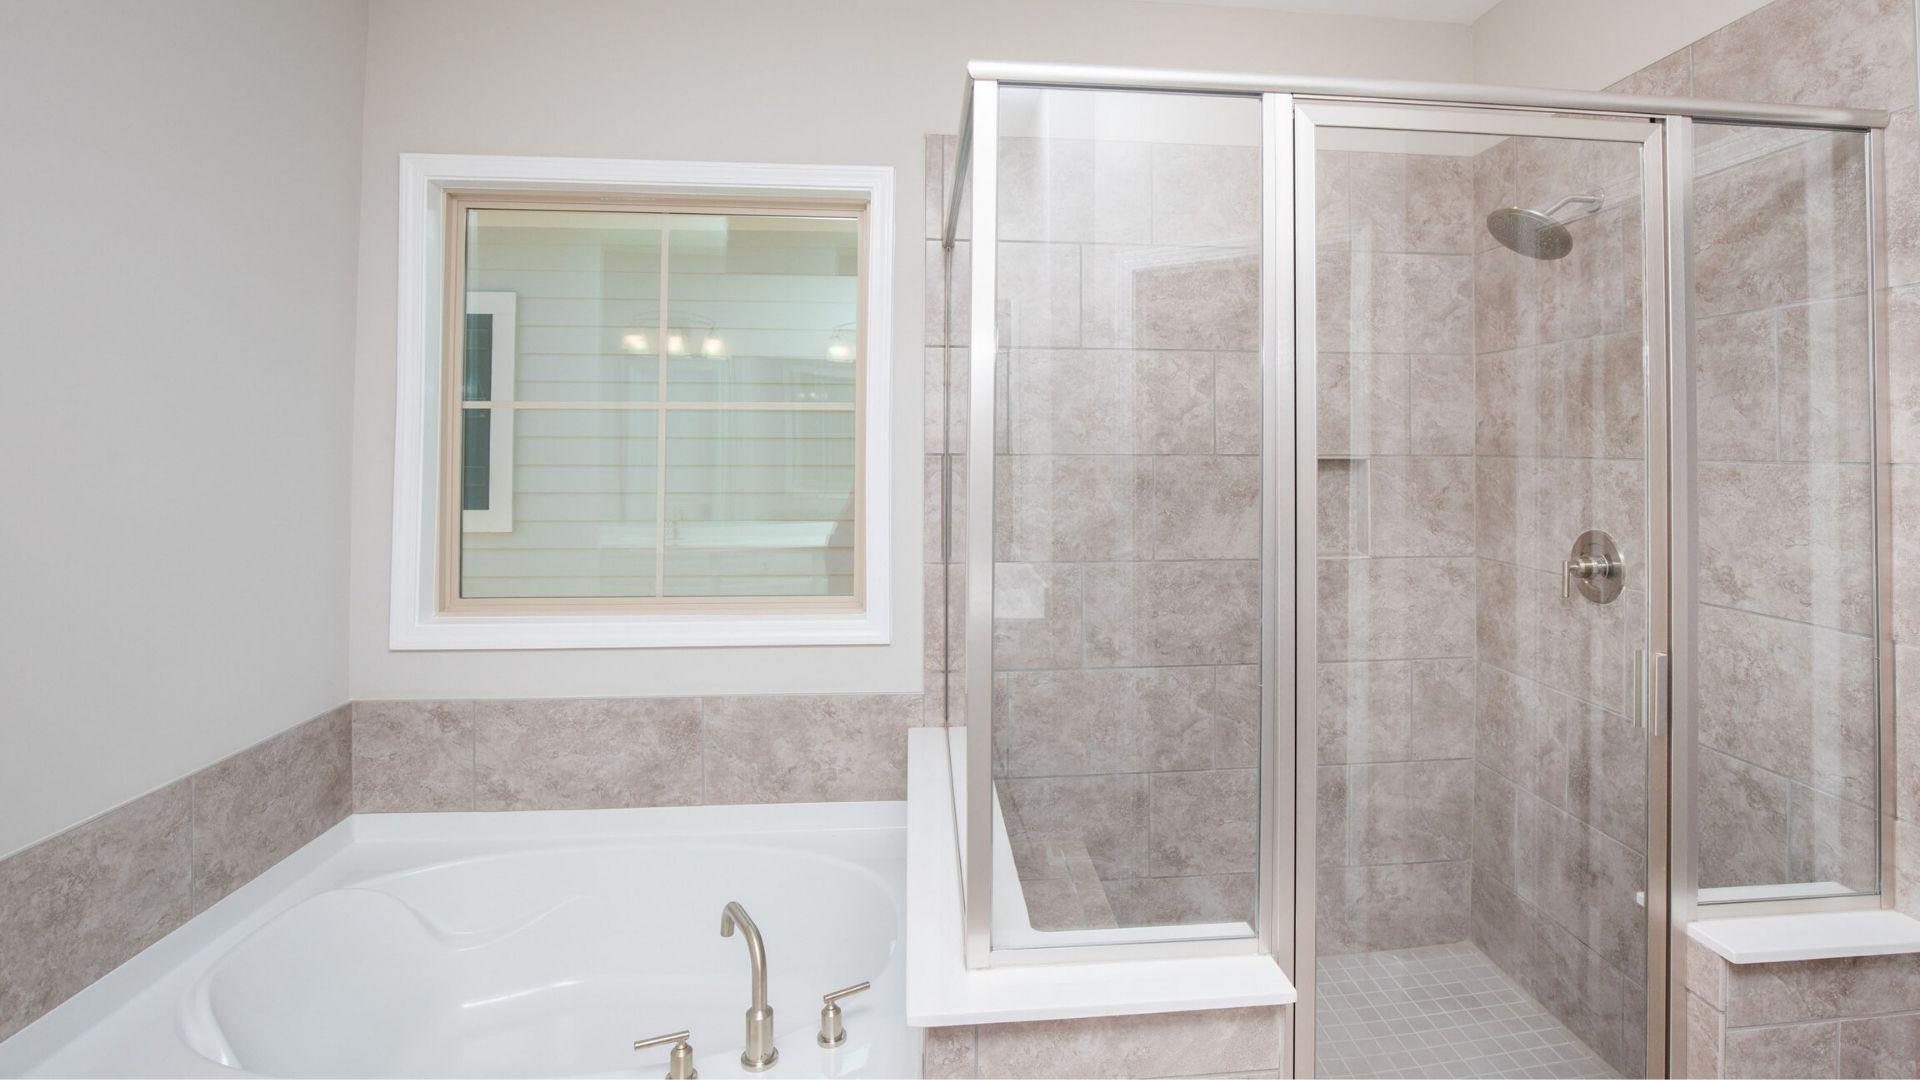 Bathroom featured in the Parker By Lennar in Atlanta, GA